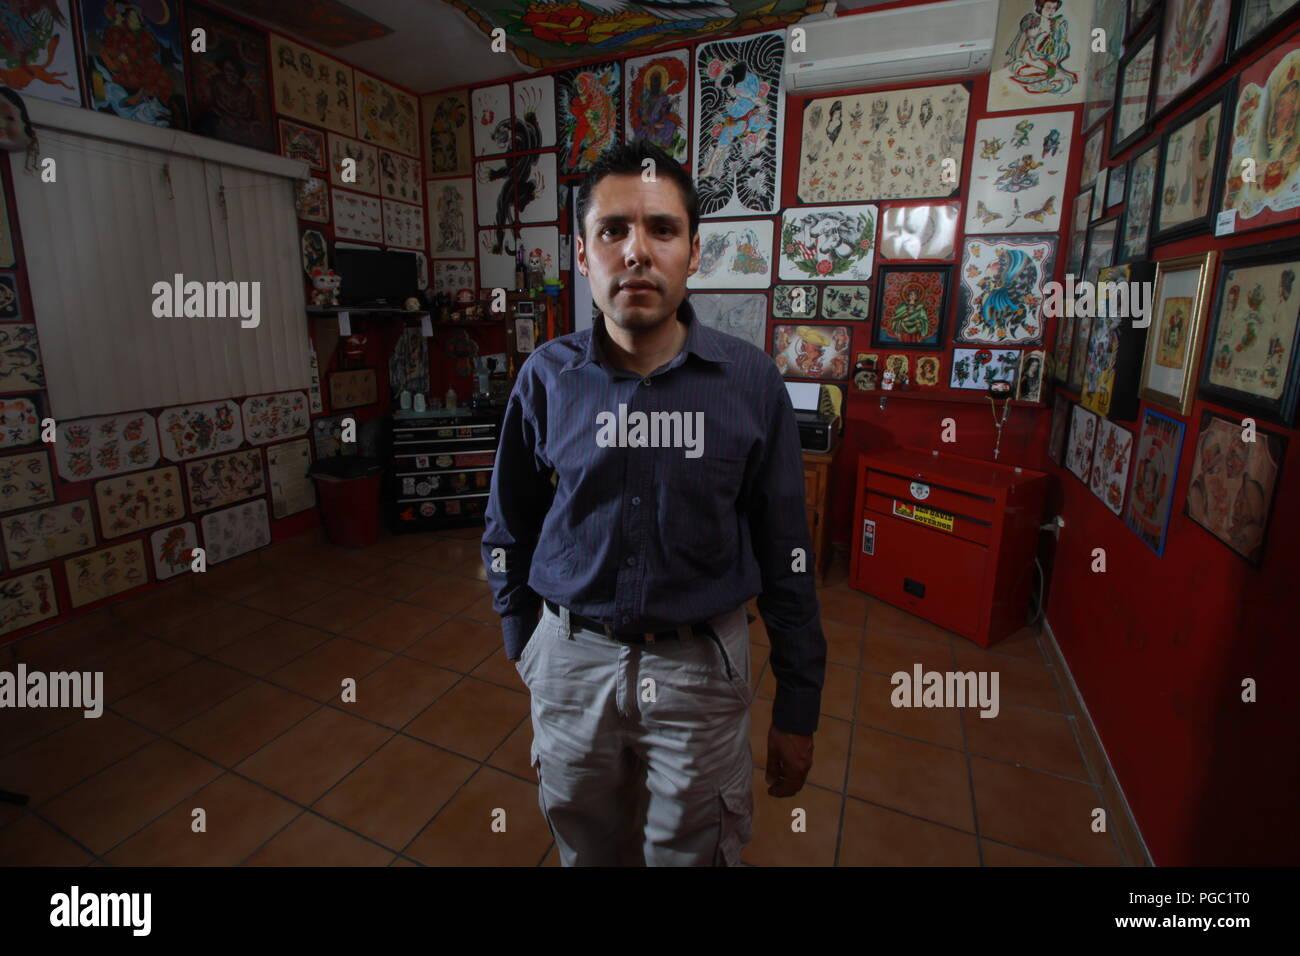 Fausto Ibarra en estudio de tatoo - Stock Image